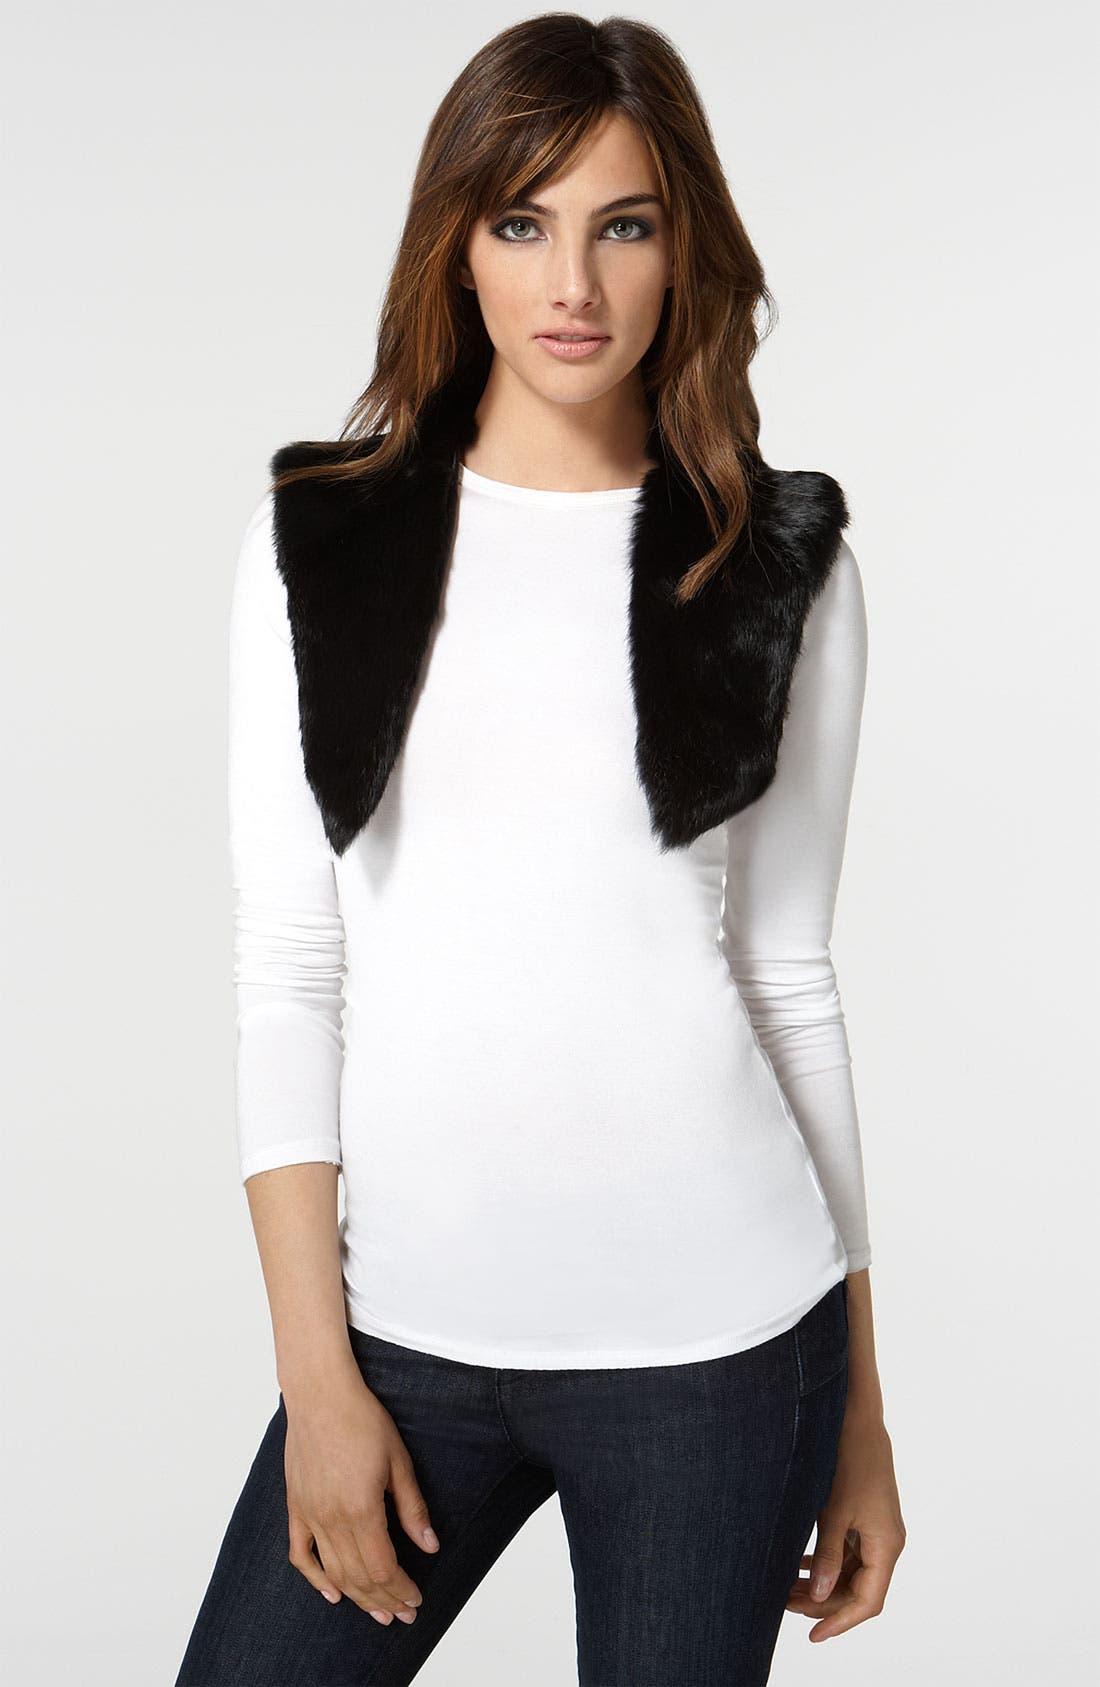 'Nicola' Coat with Removable Genuine Rabbit Fur Vest,                             Alternate thumbnail 2, color,                             001